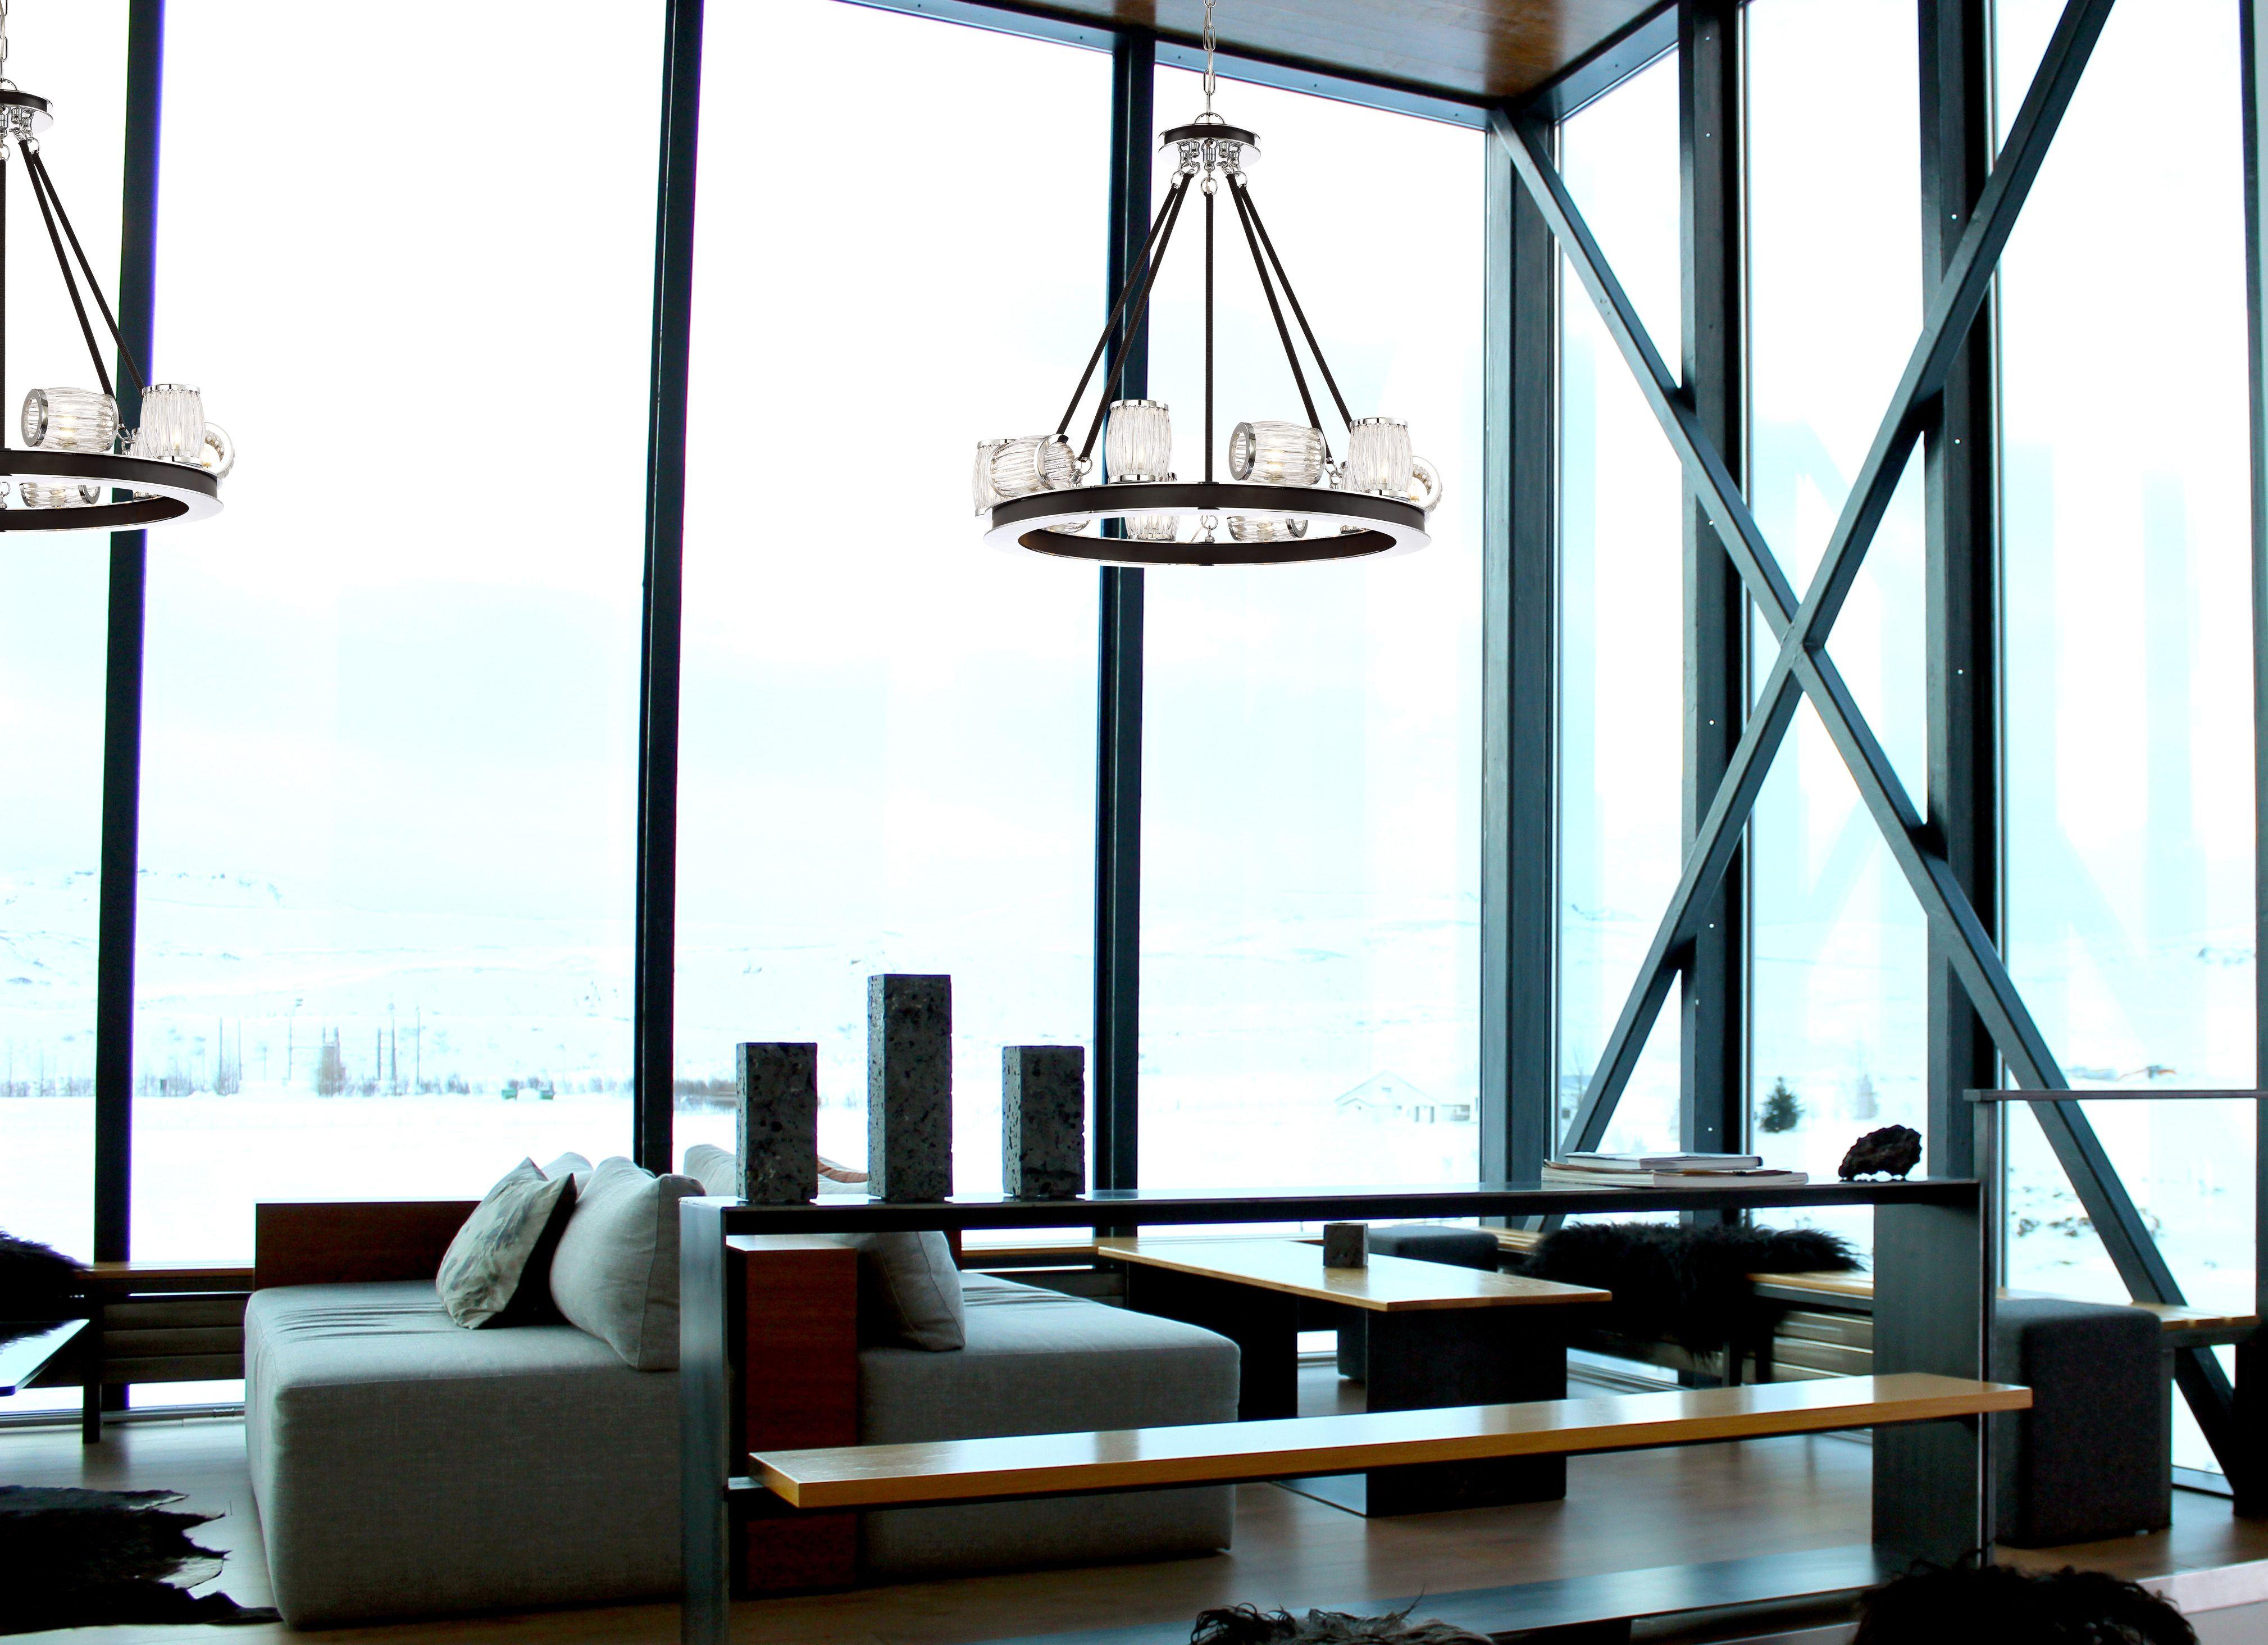 Room Products Lighting design Design trends